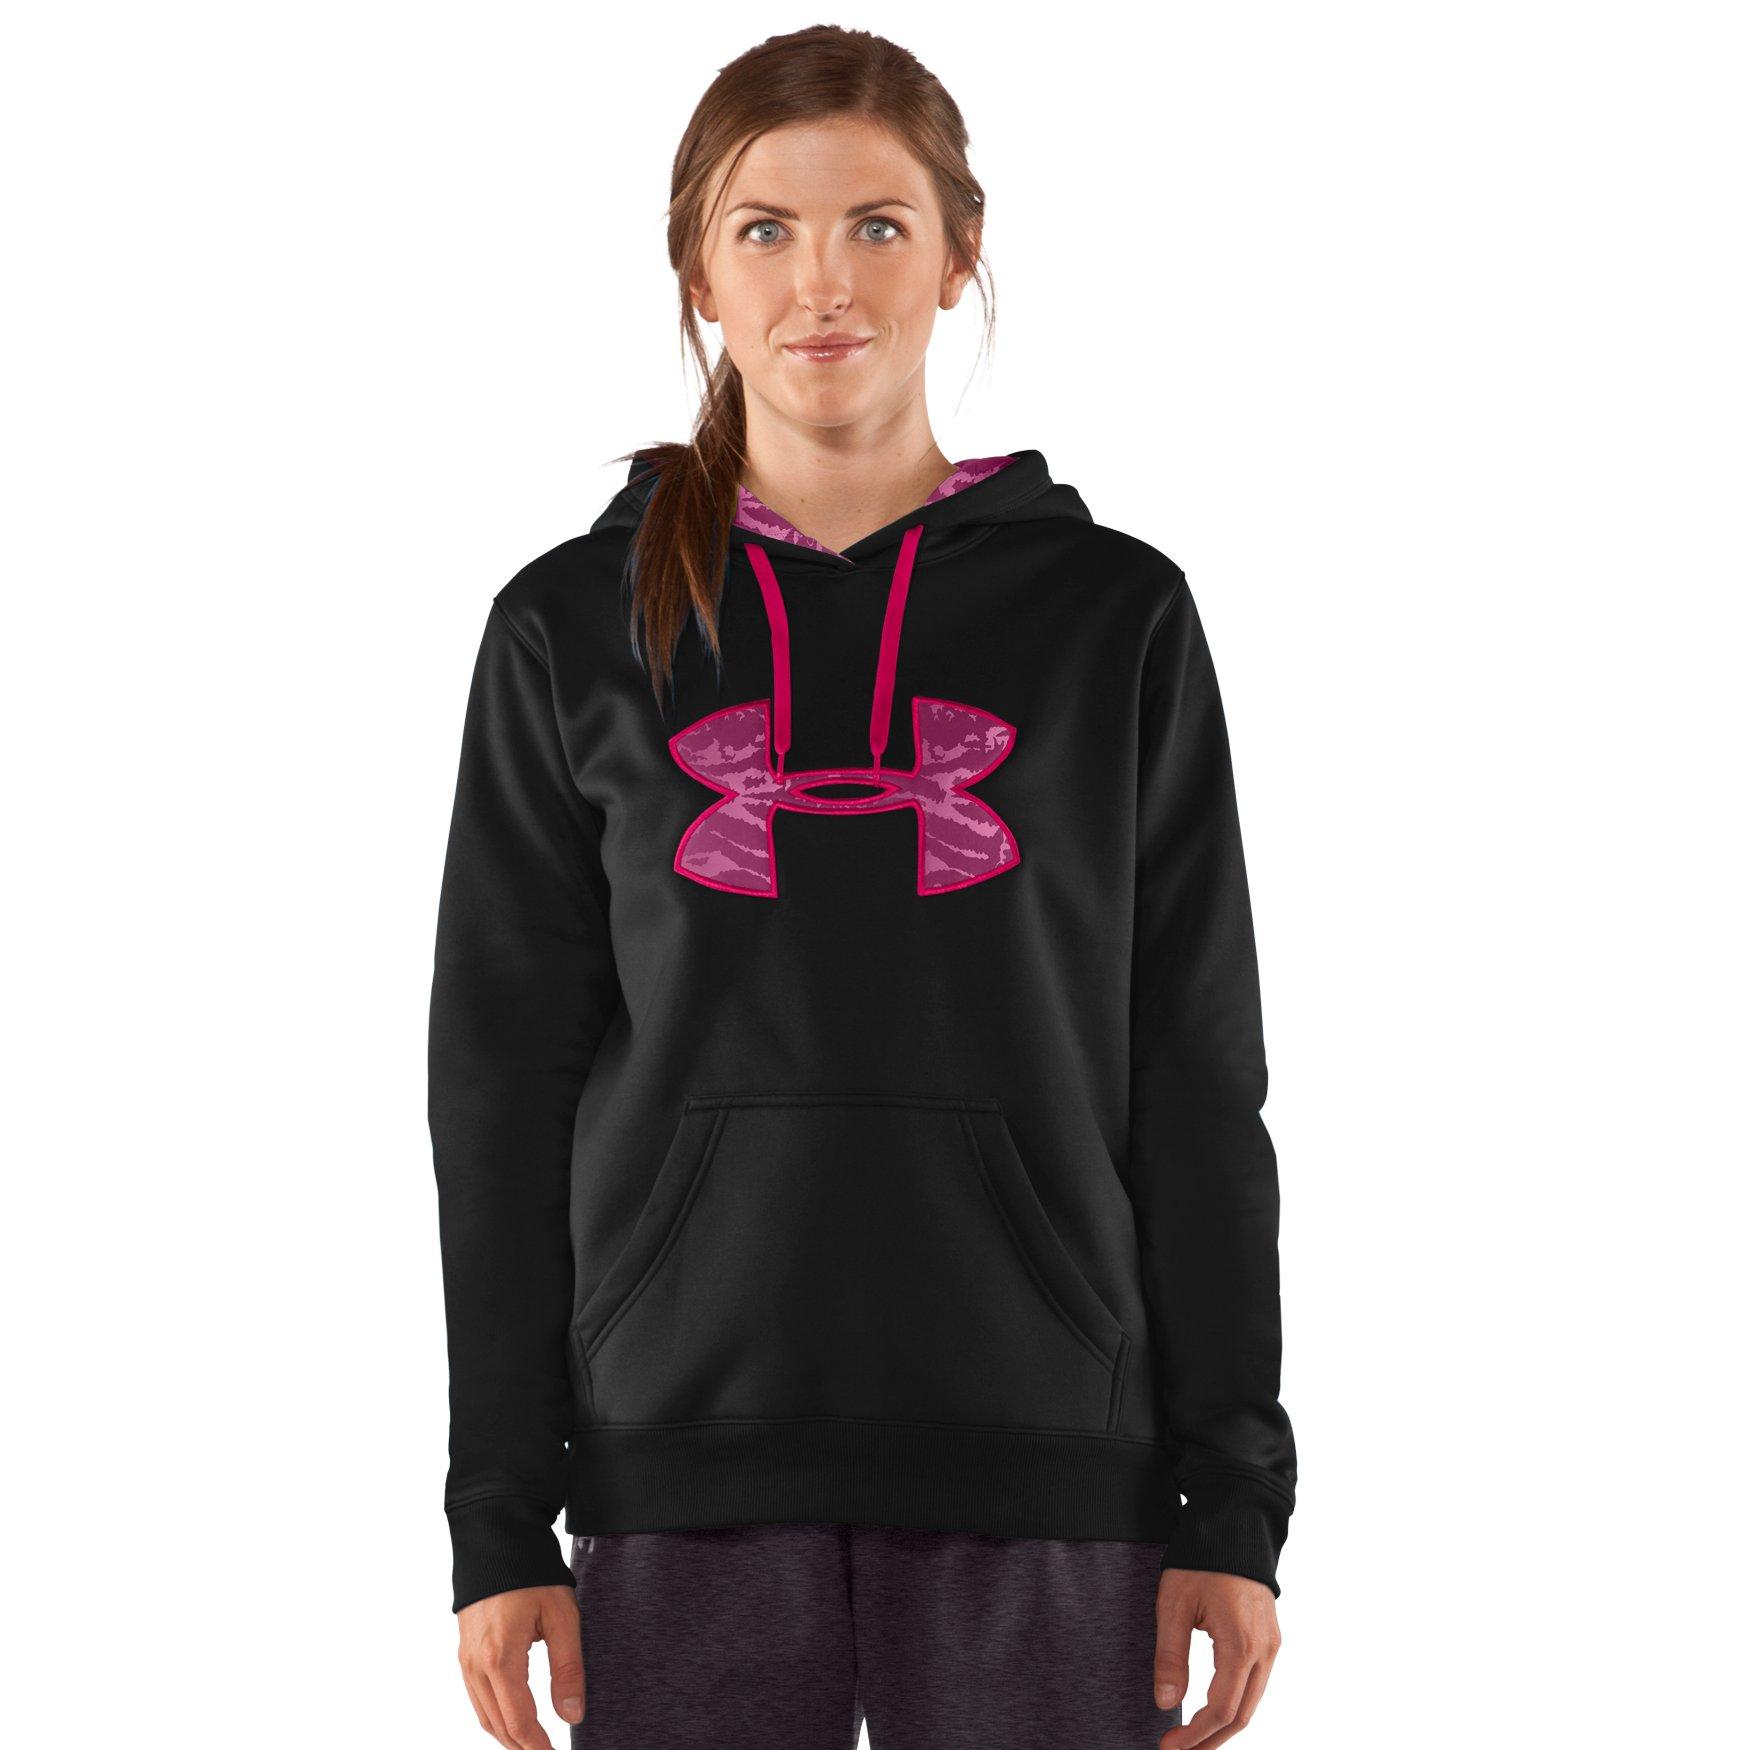 7a25d2d3652d7 Amber Asks About Women s Armour® Fleece Storm Printed Big Logo Hoody -  Needle